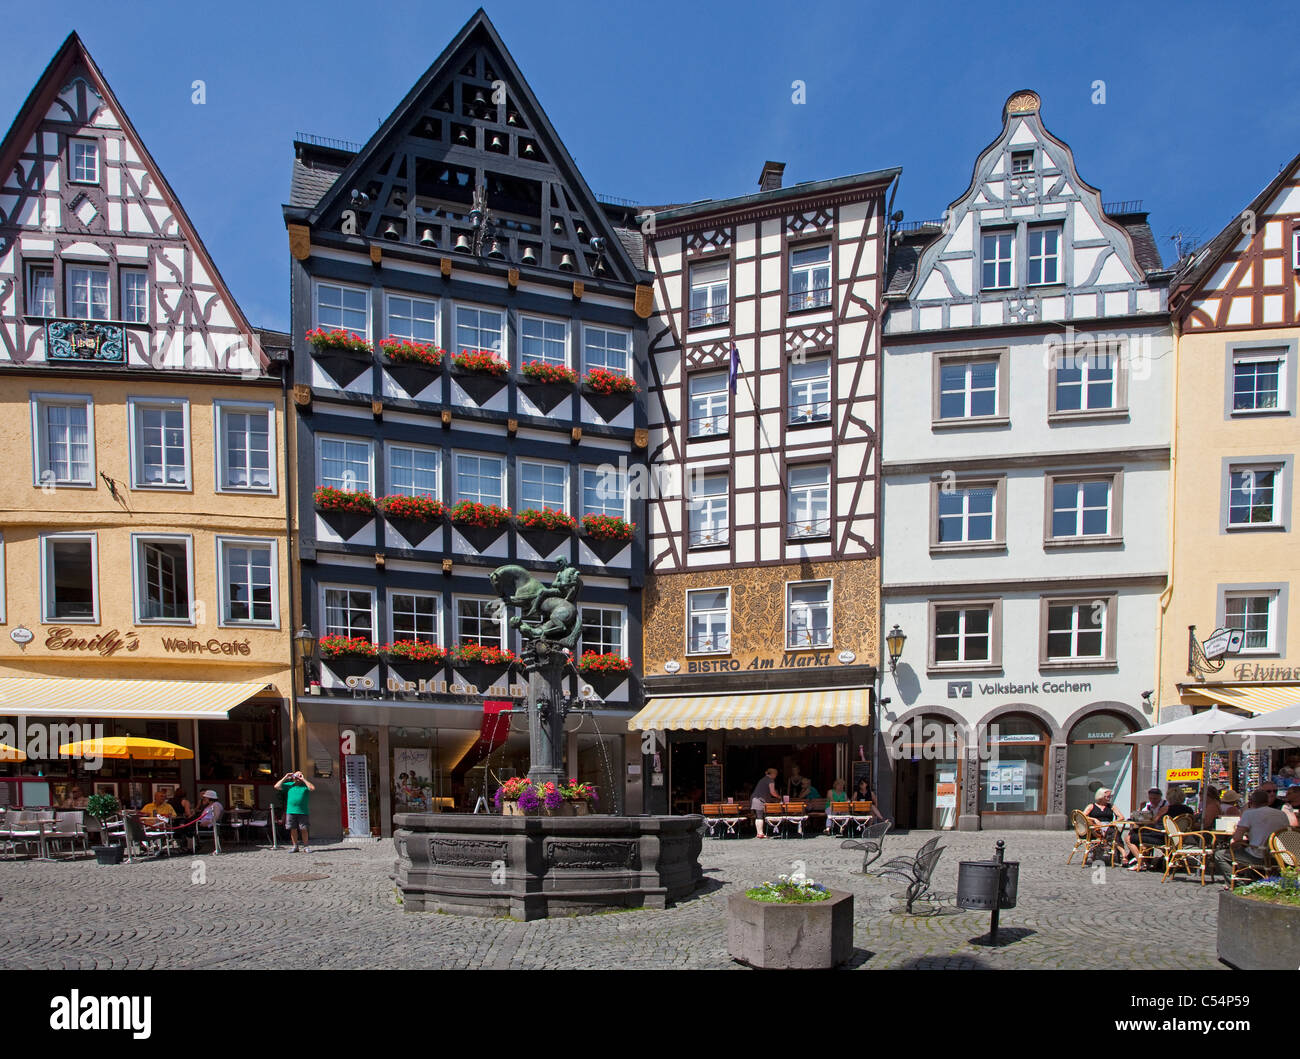 Cochem, Marktplatz Mit Historischem Brunnen, Historischer Stadtkern, Marktplatz, Brunnen, gut auf dem Marktplatz Stockbild